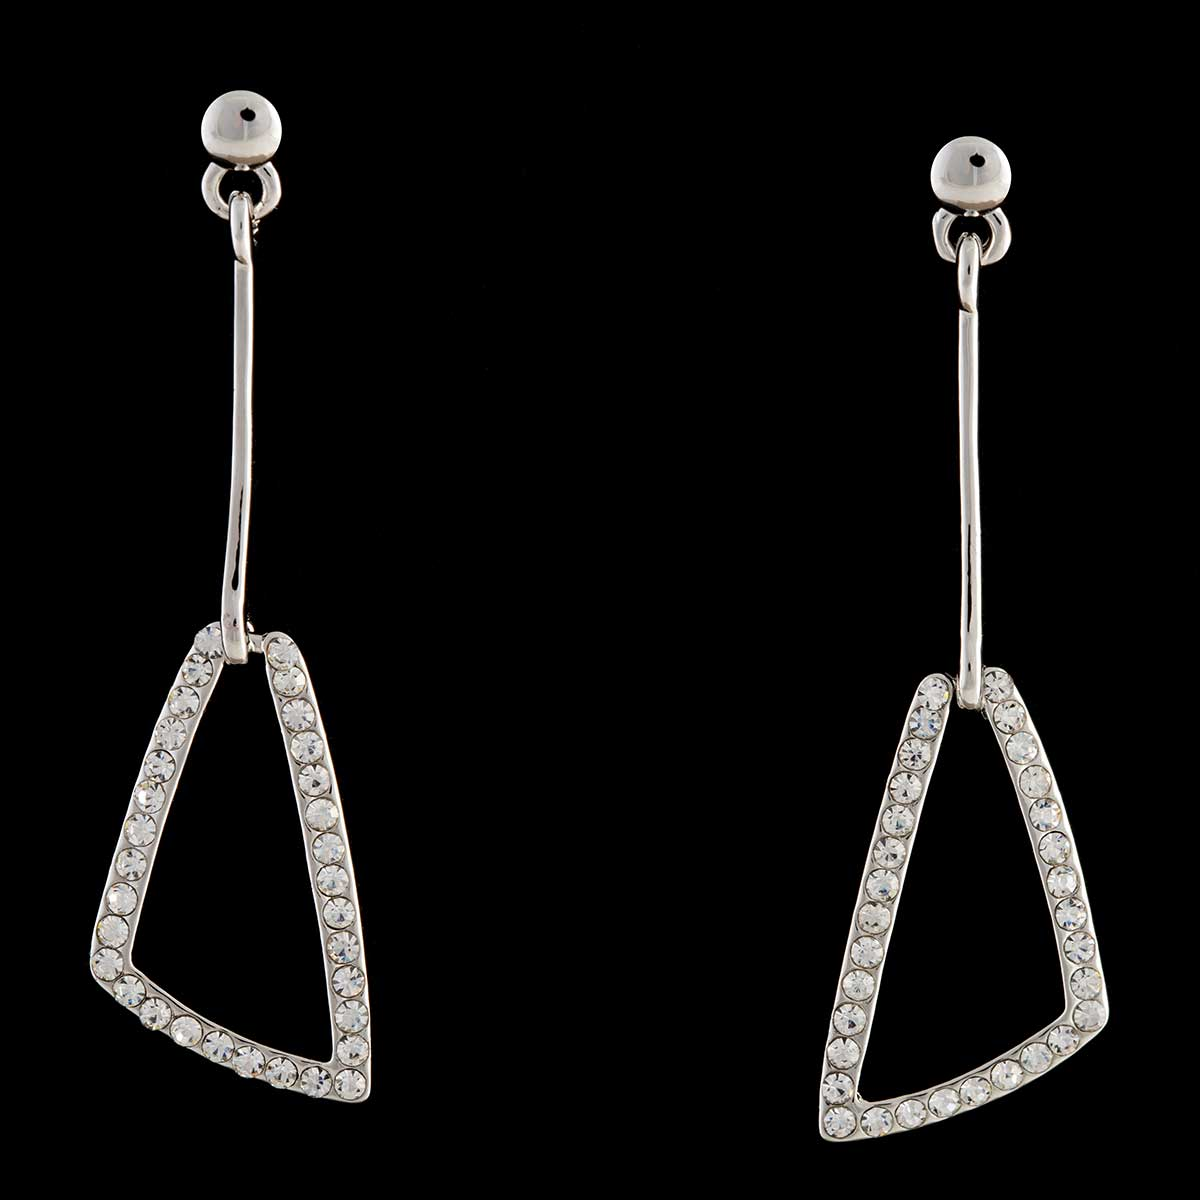 Silver Crystal Dangle Post Earrings